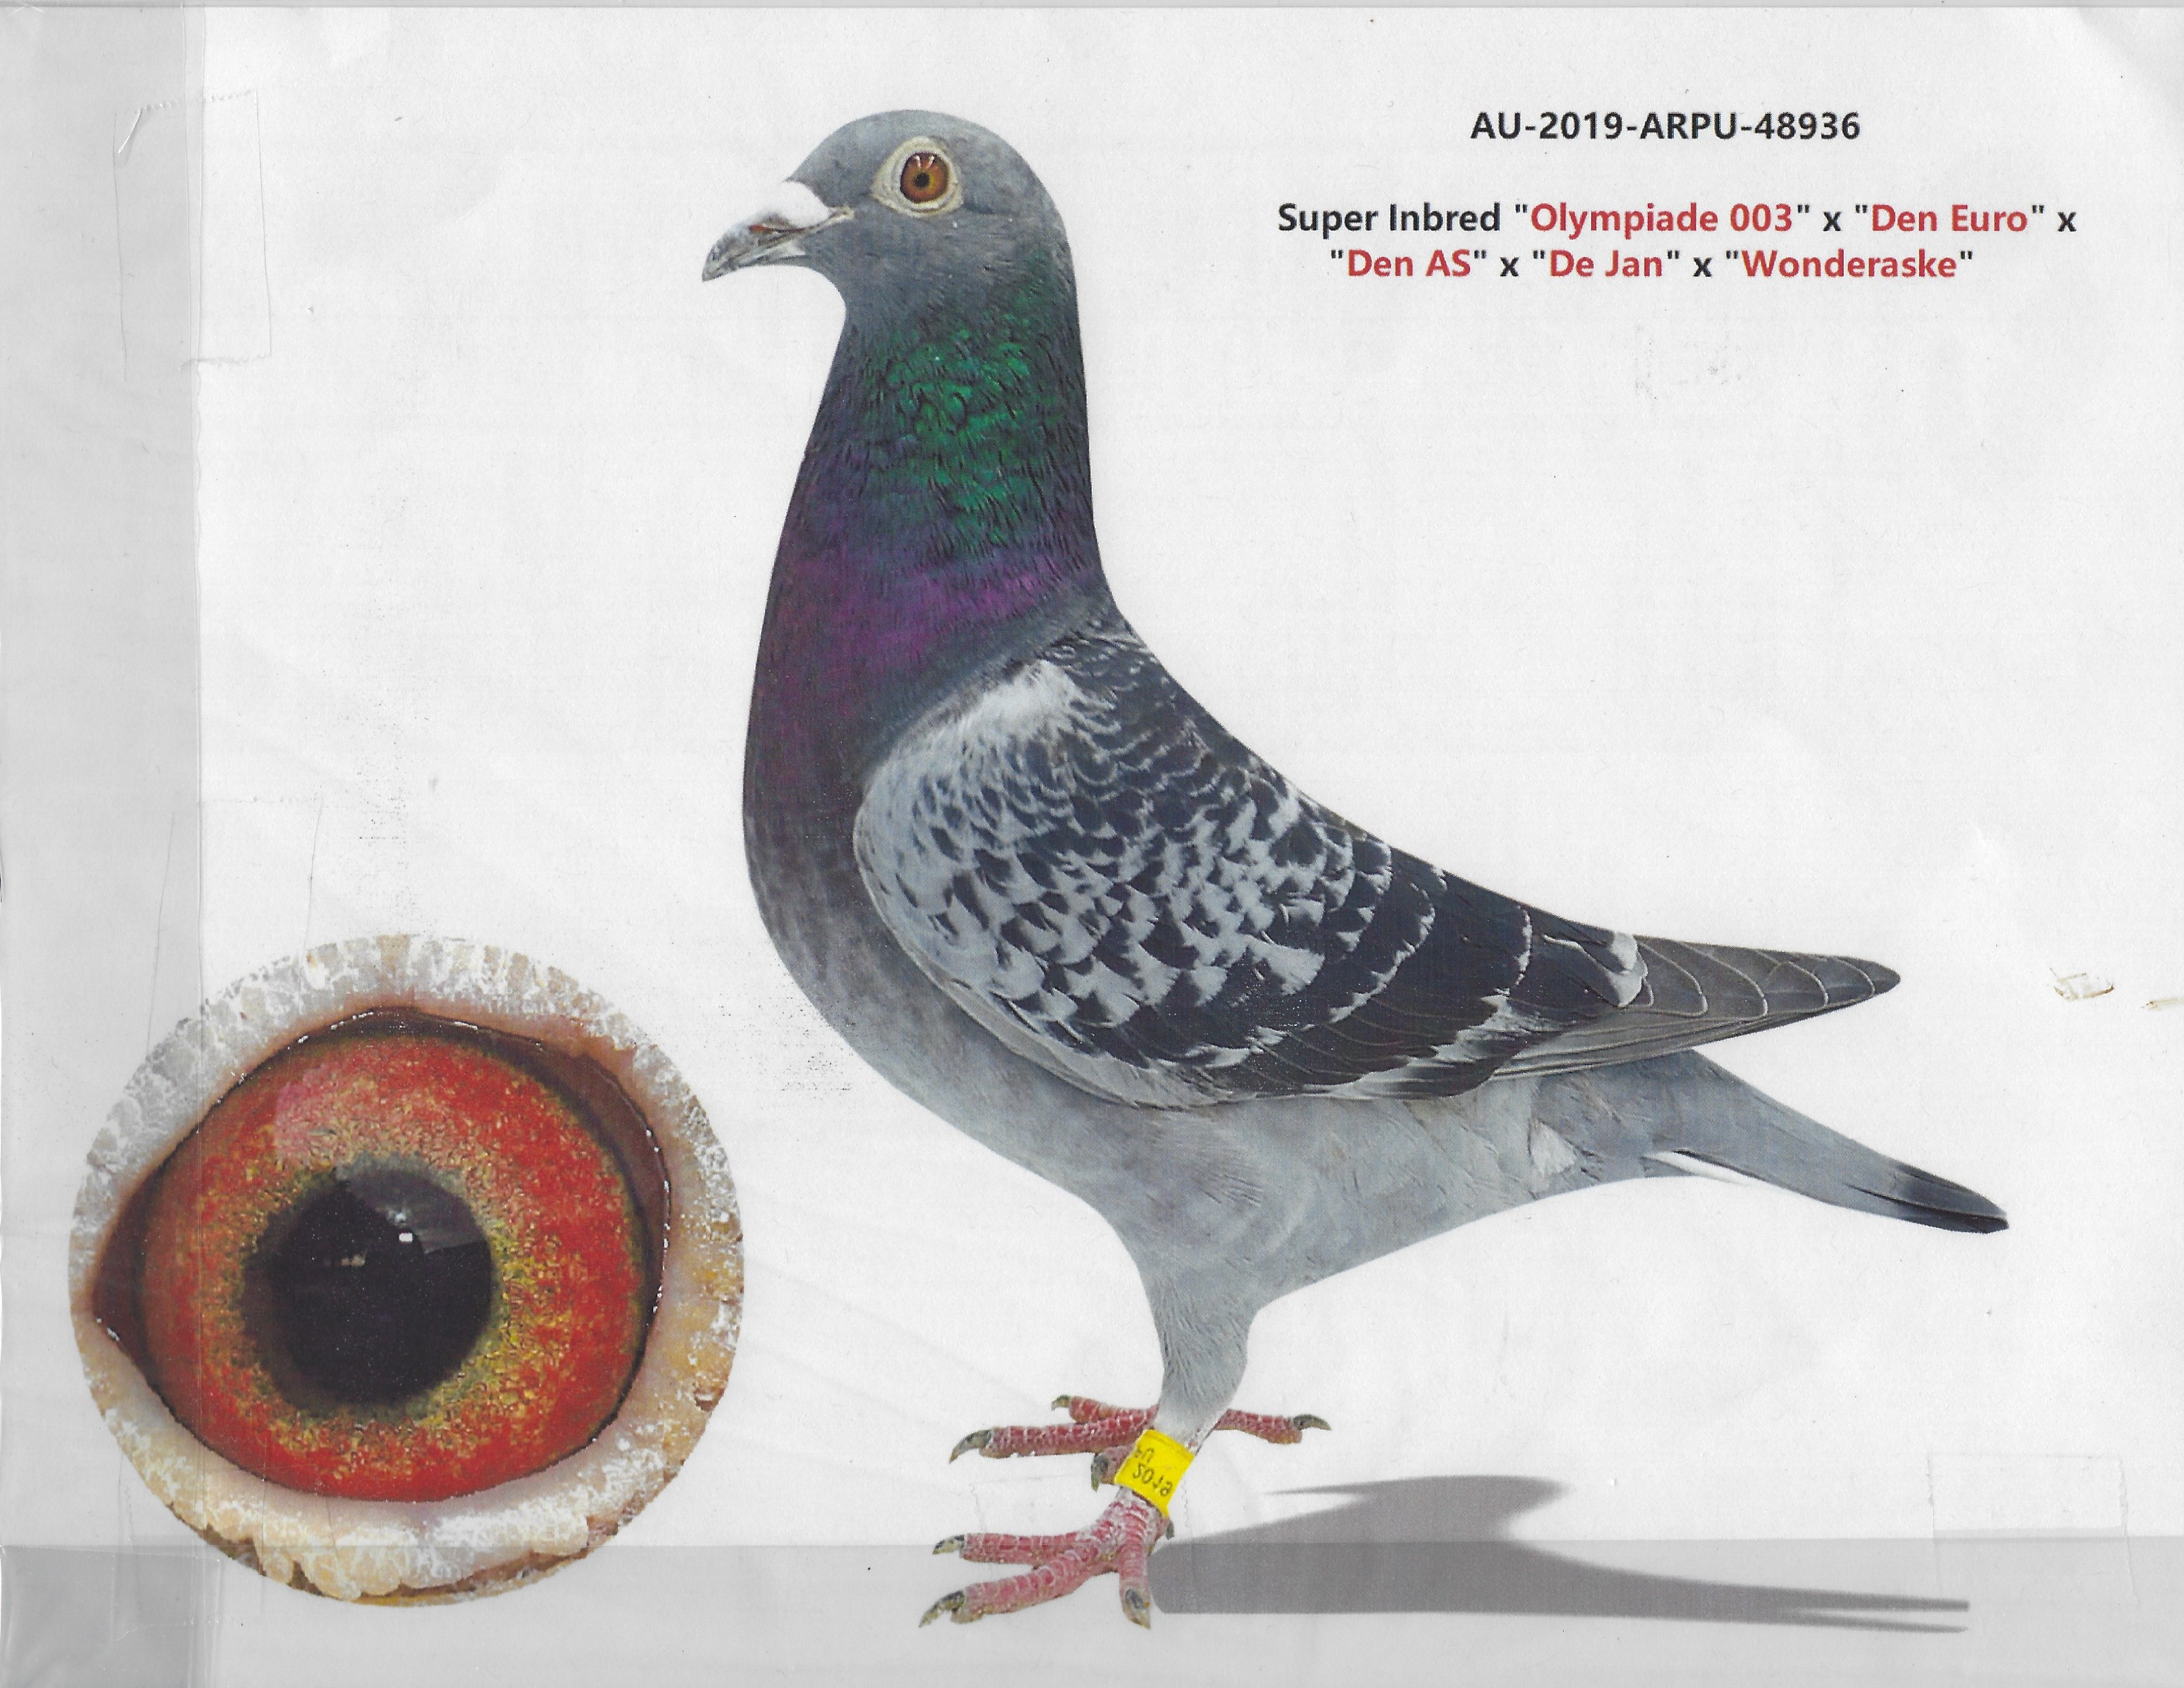 AU 2019 ARPU 48936 - BC Hen